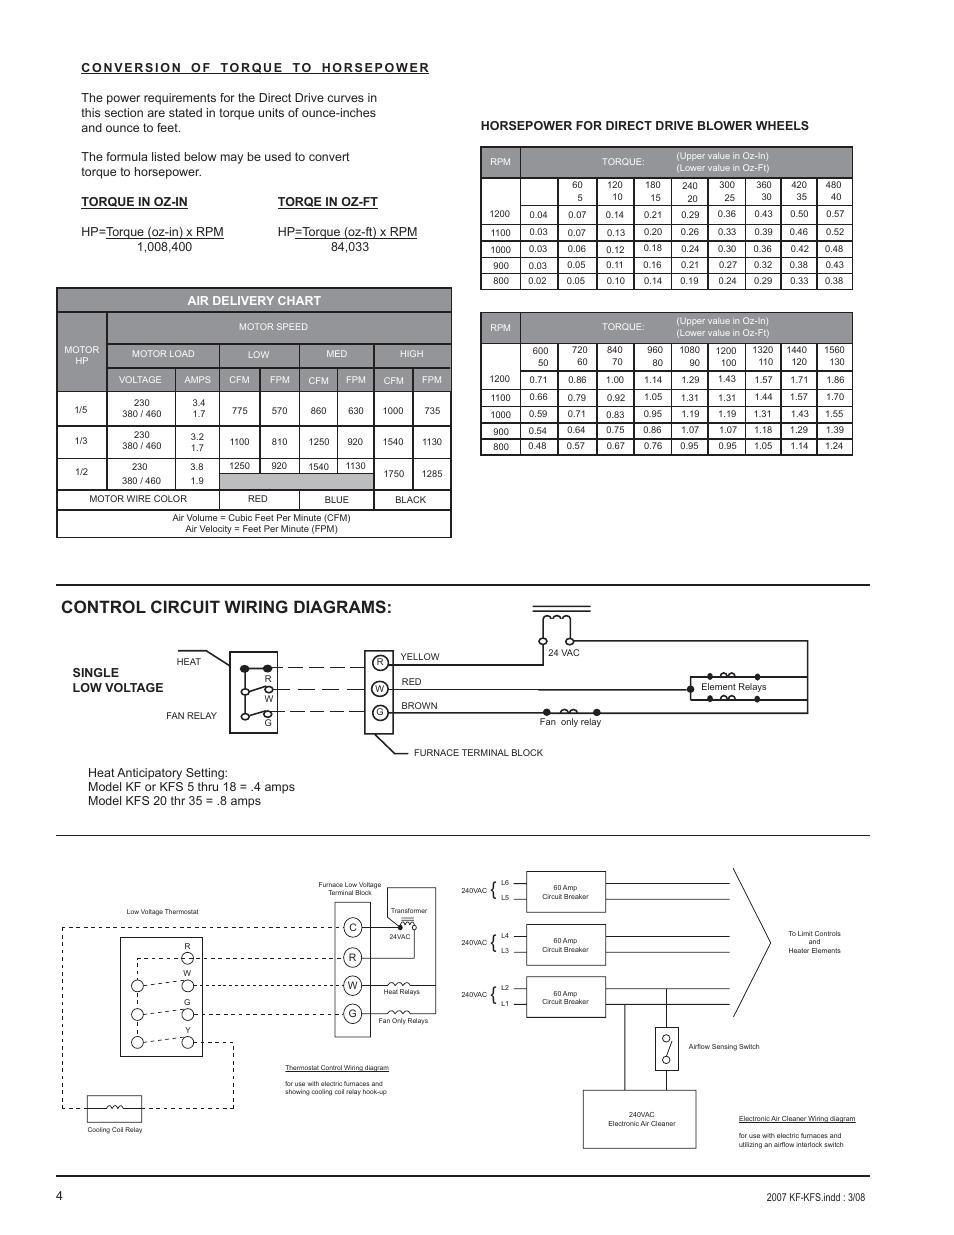 Control Circuit Wiring Diagrams